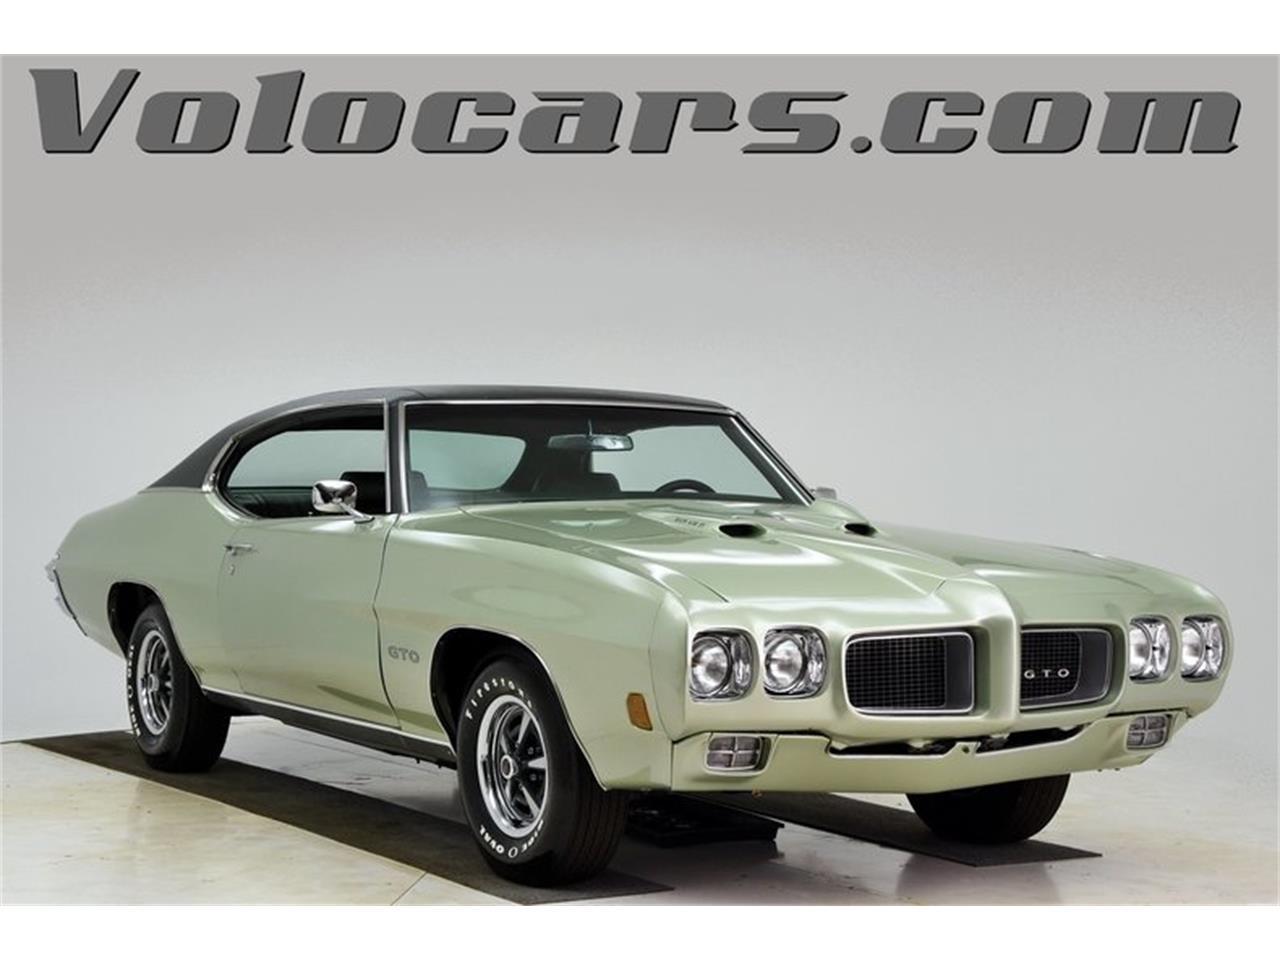 For Sale: 1970 Pontiac GTO Ram Air IV in Volo, Illinois